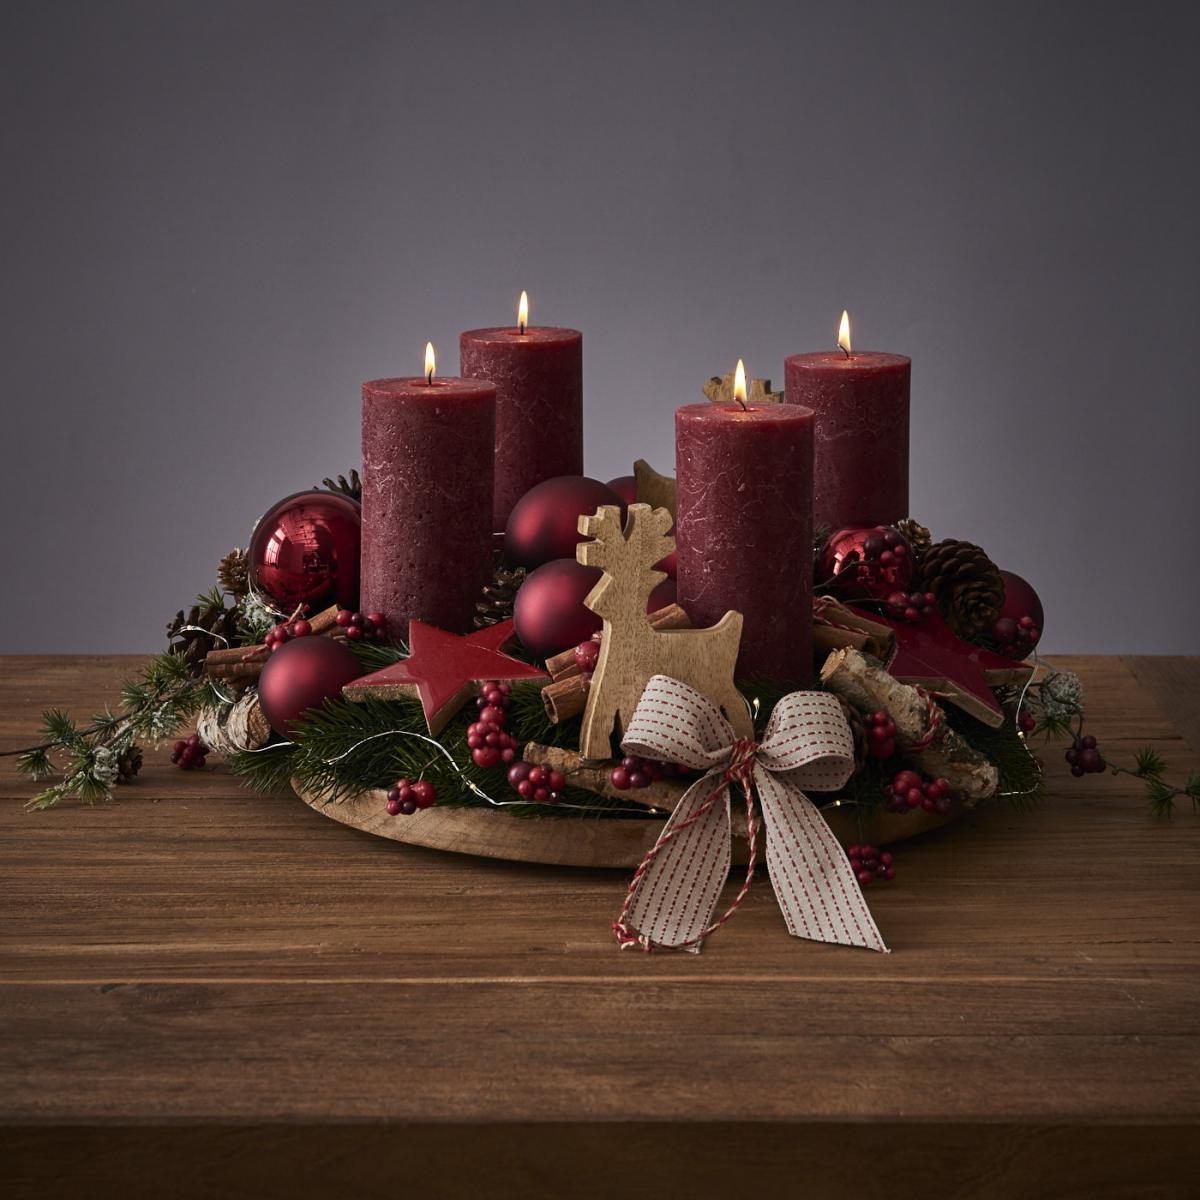 klassischer adventskranz binden sch n bei dir by depot. Black Bedroom Furniture Sets. Home Design Ideas